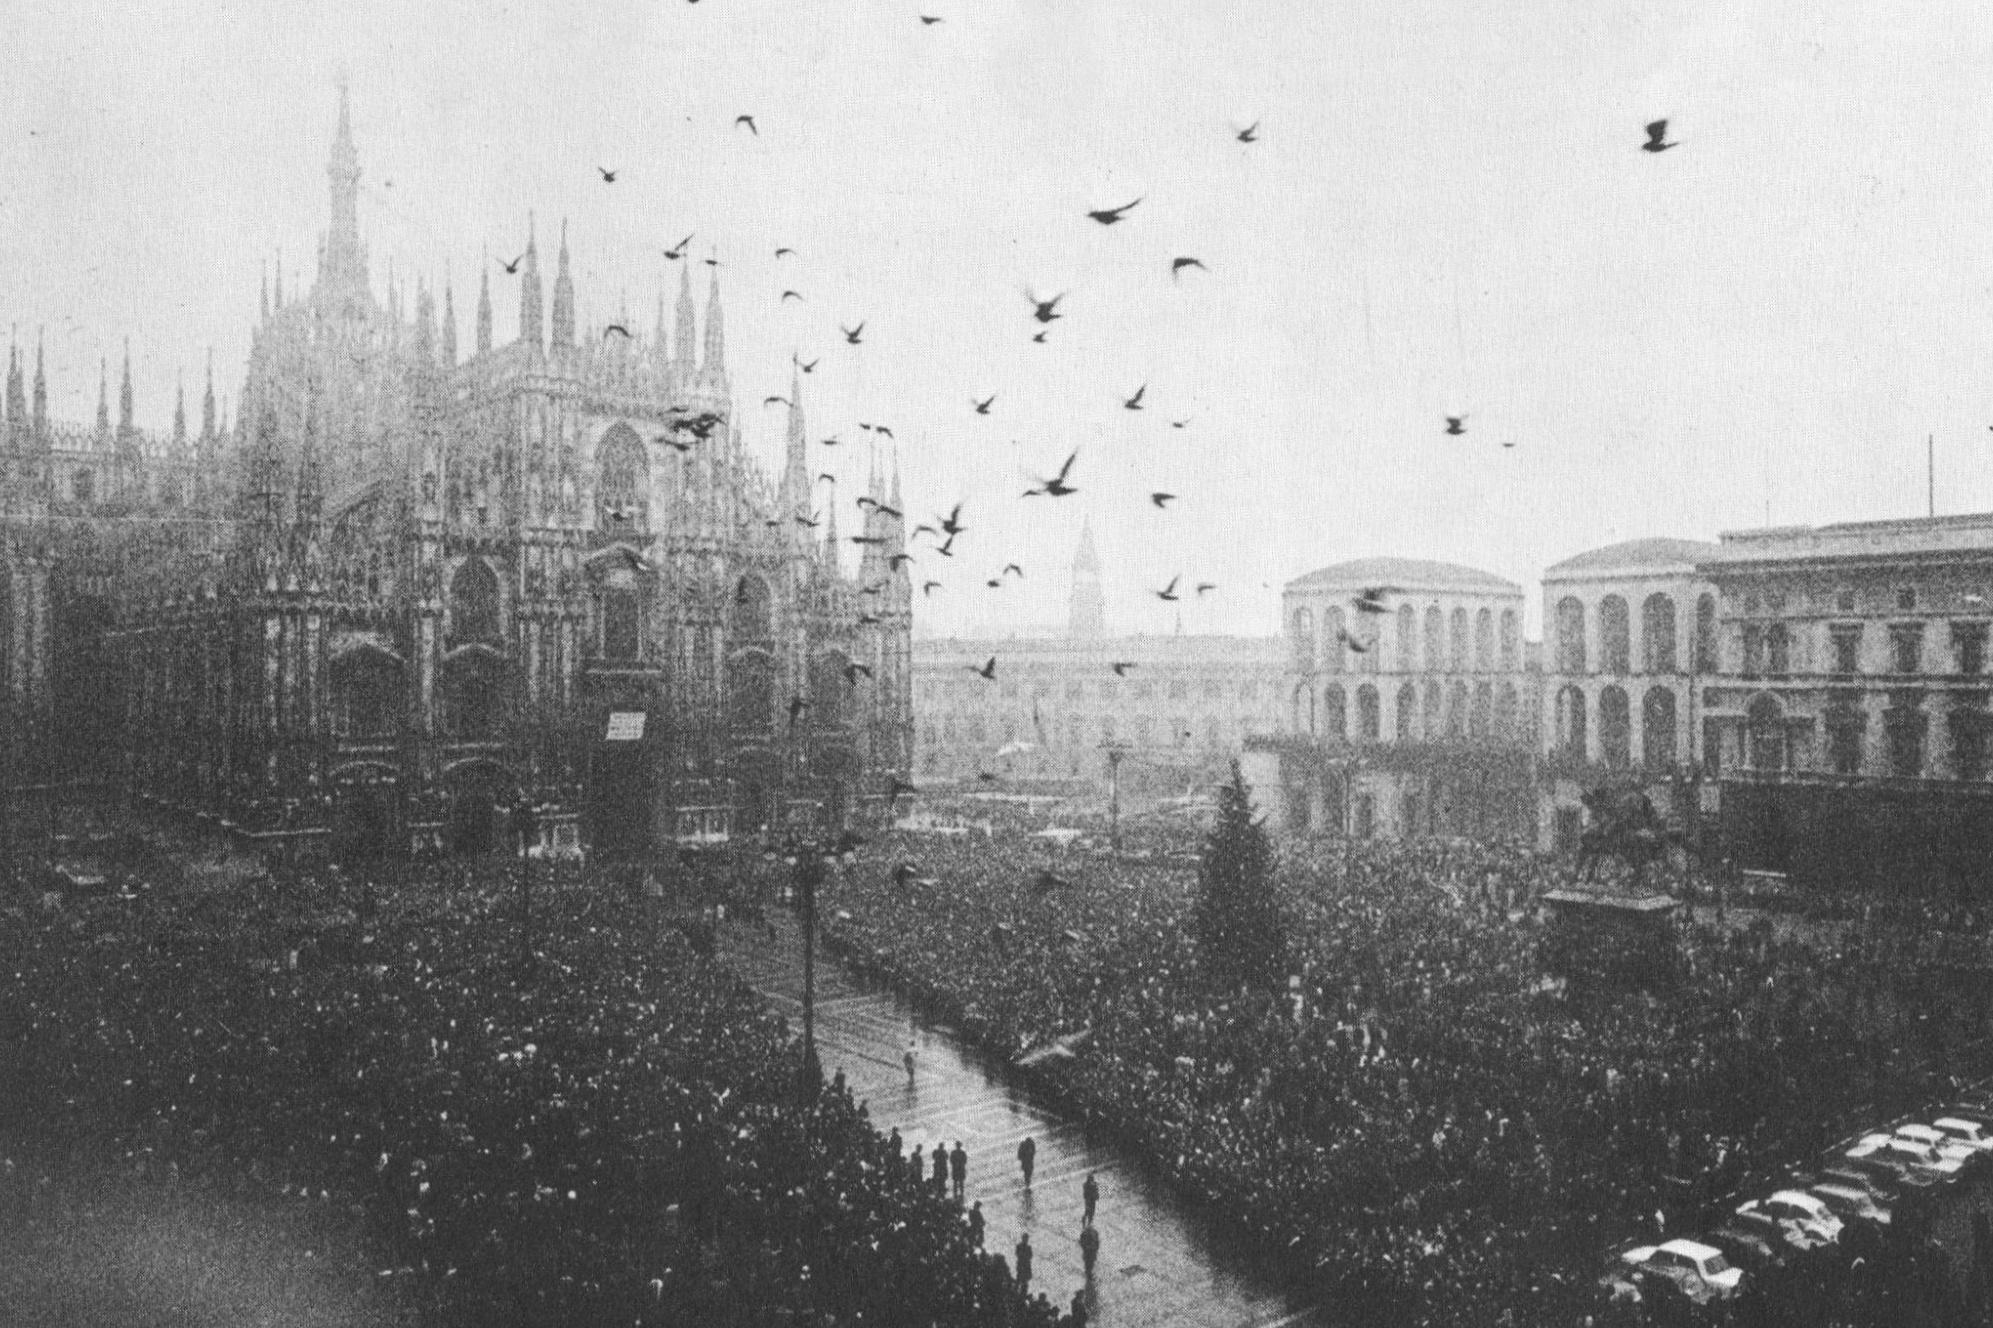 Funerali_morti_piazza_fontana Cropped